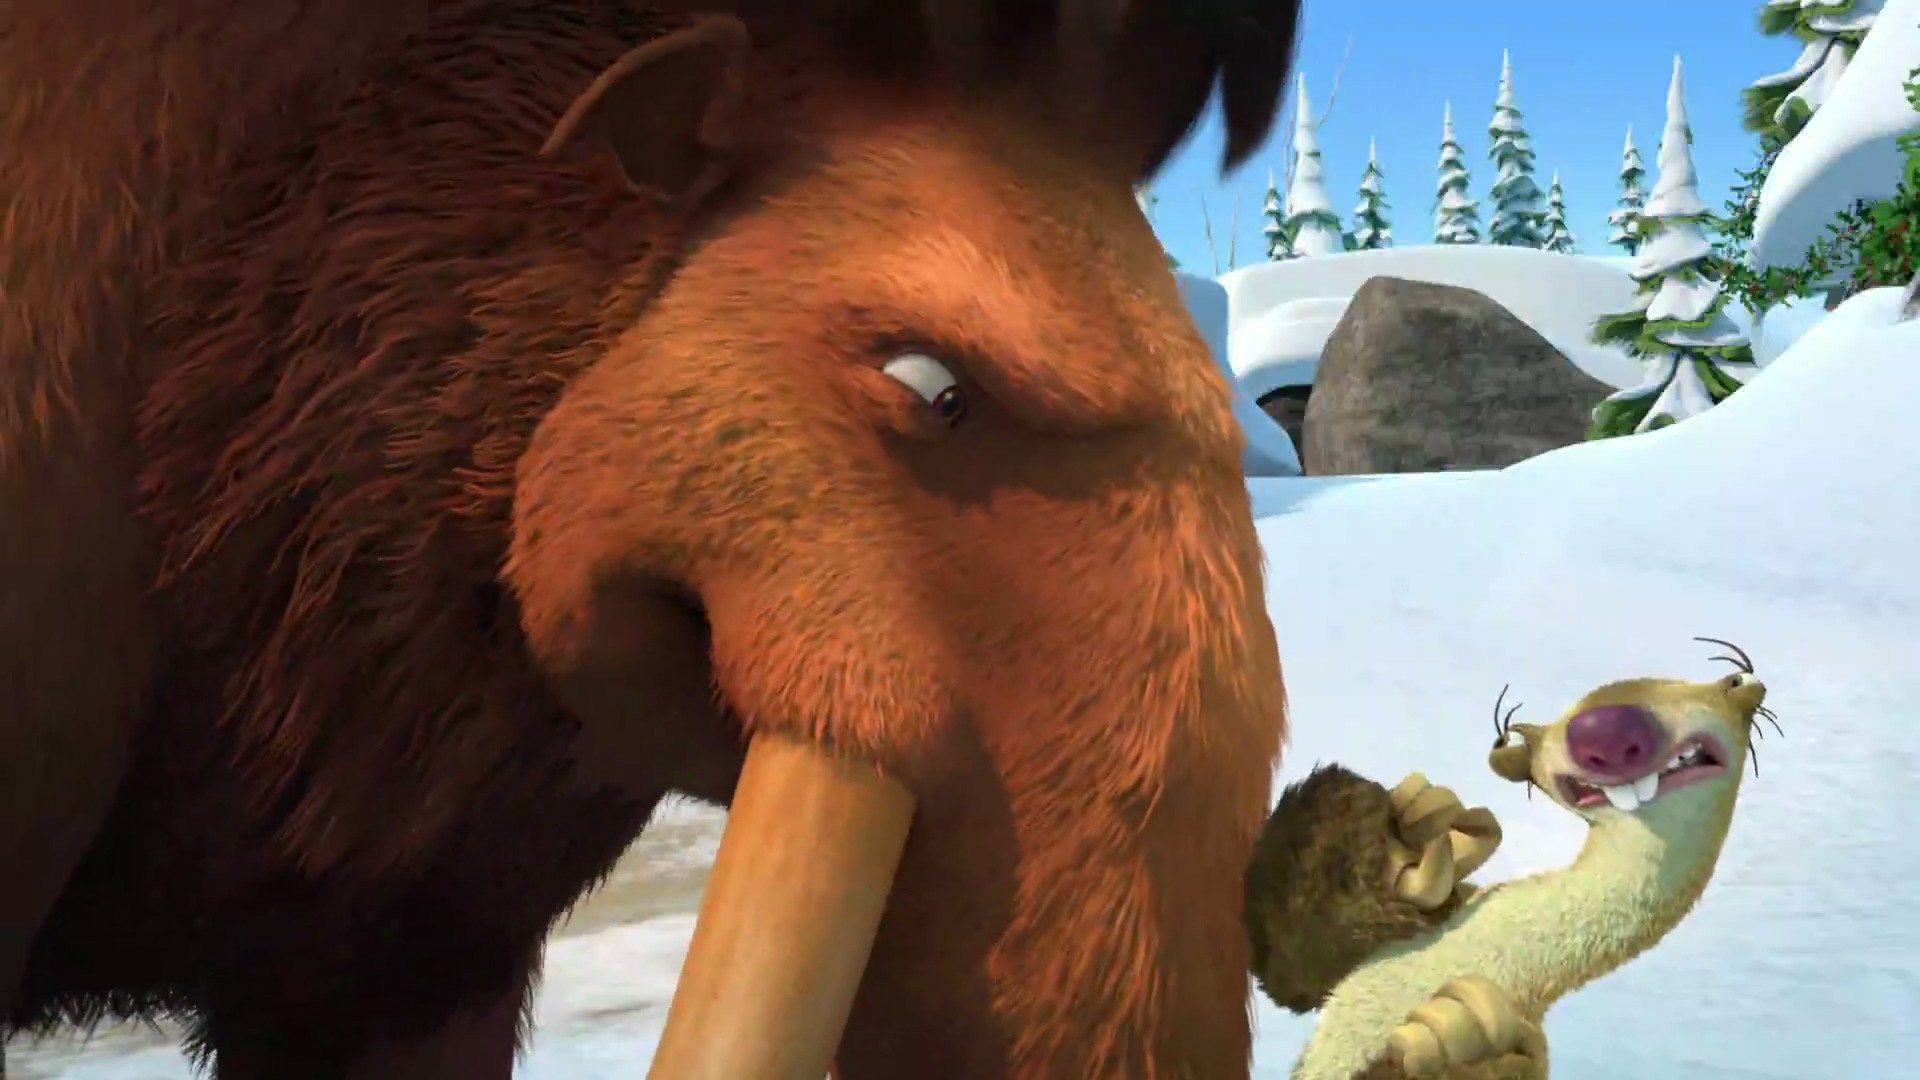 Ice Age A Mammoth Christmas.Ice Age A Mammoth Christmas 2011 Animation Screencaps